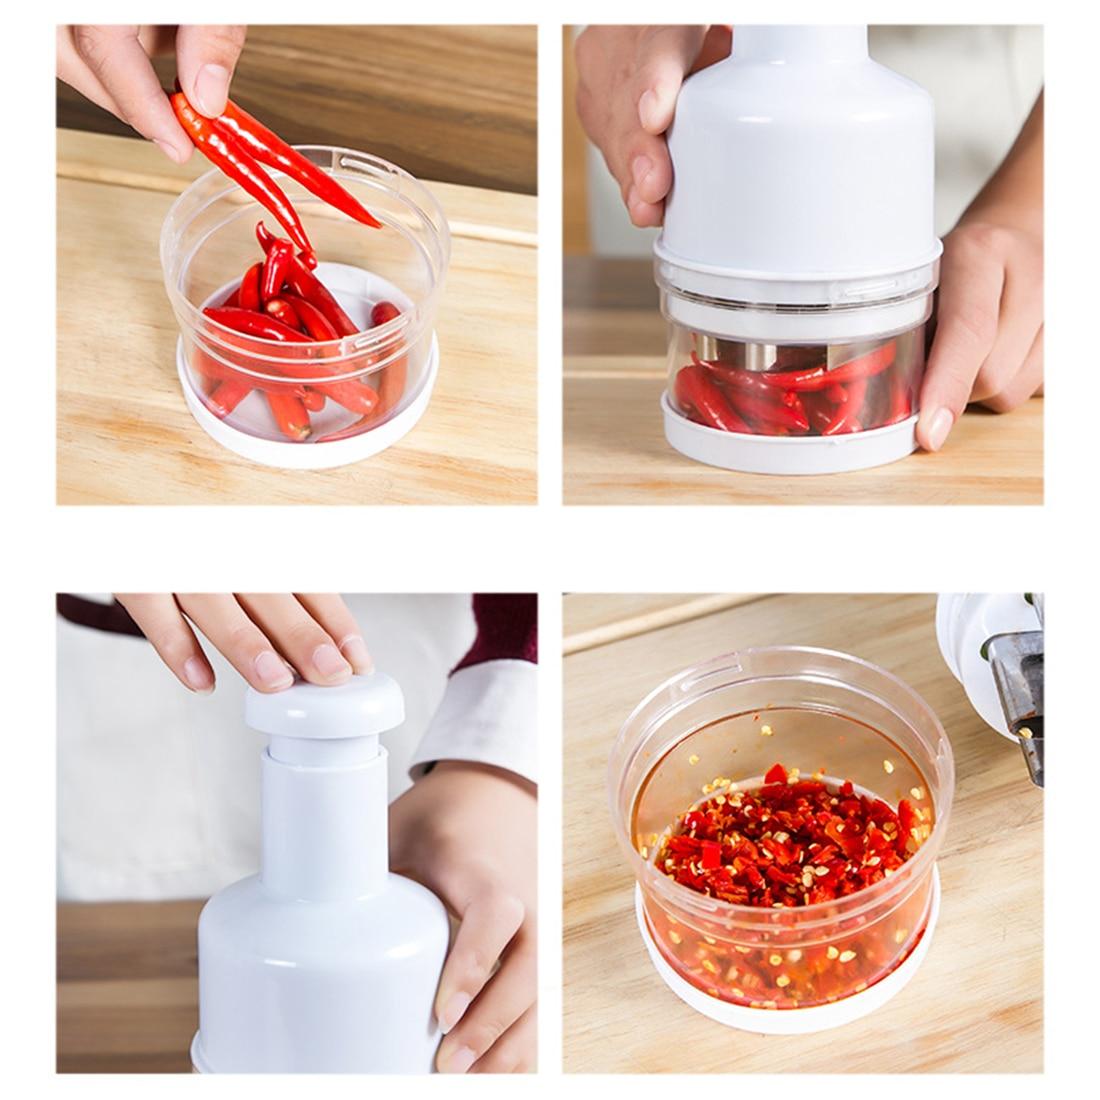 Multi-function shredder chopper cutting onions device mash the garlic vegetable shredder garlic presses kitchen gadgets tools